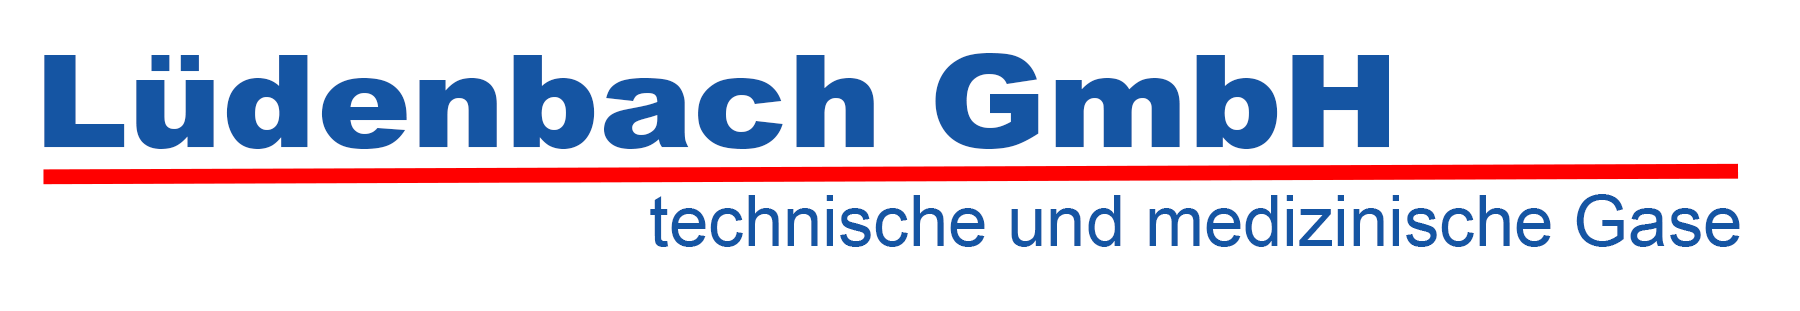 Luedenbach GmbH